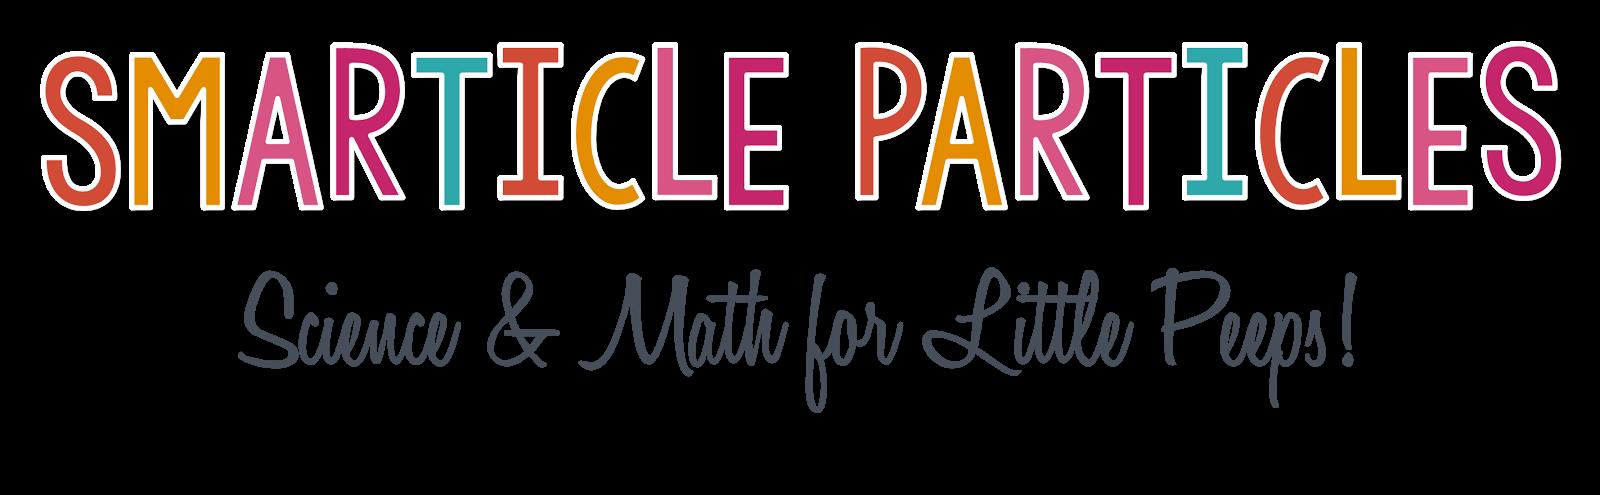 Smarticle Particles